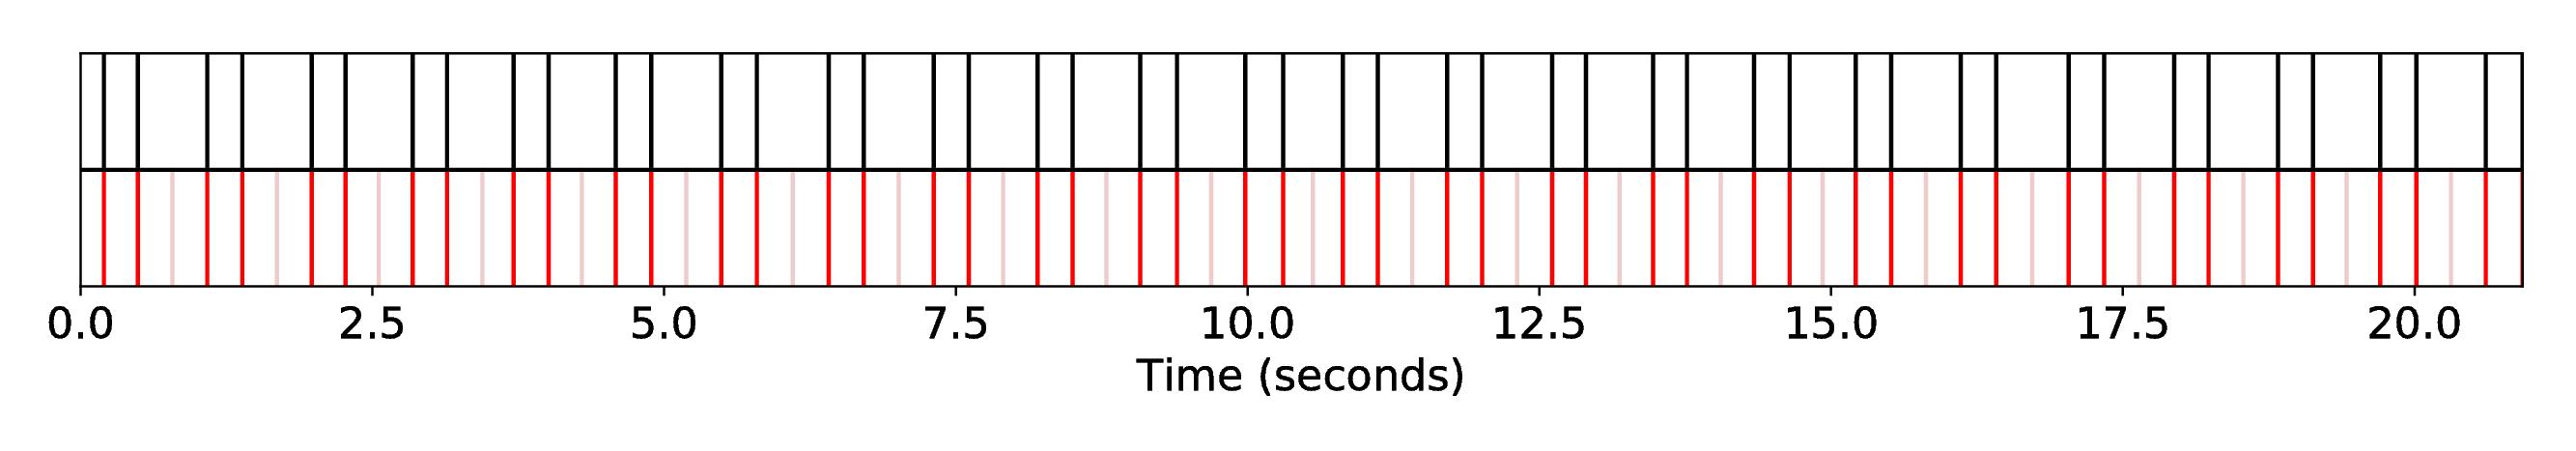 DP1_INT1_R-RW-Heart__S-Fandango__SequenceAlignment